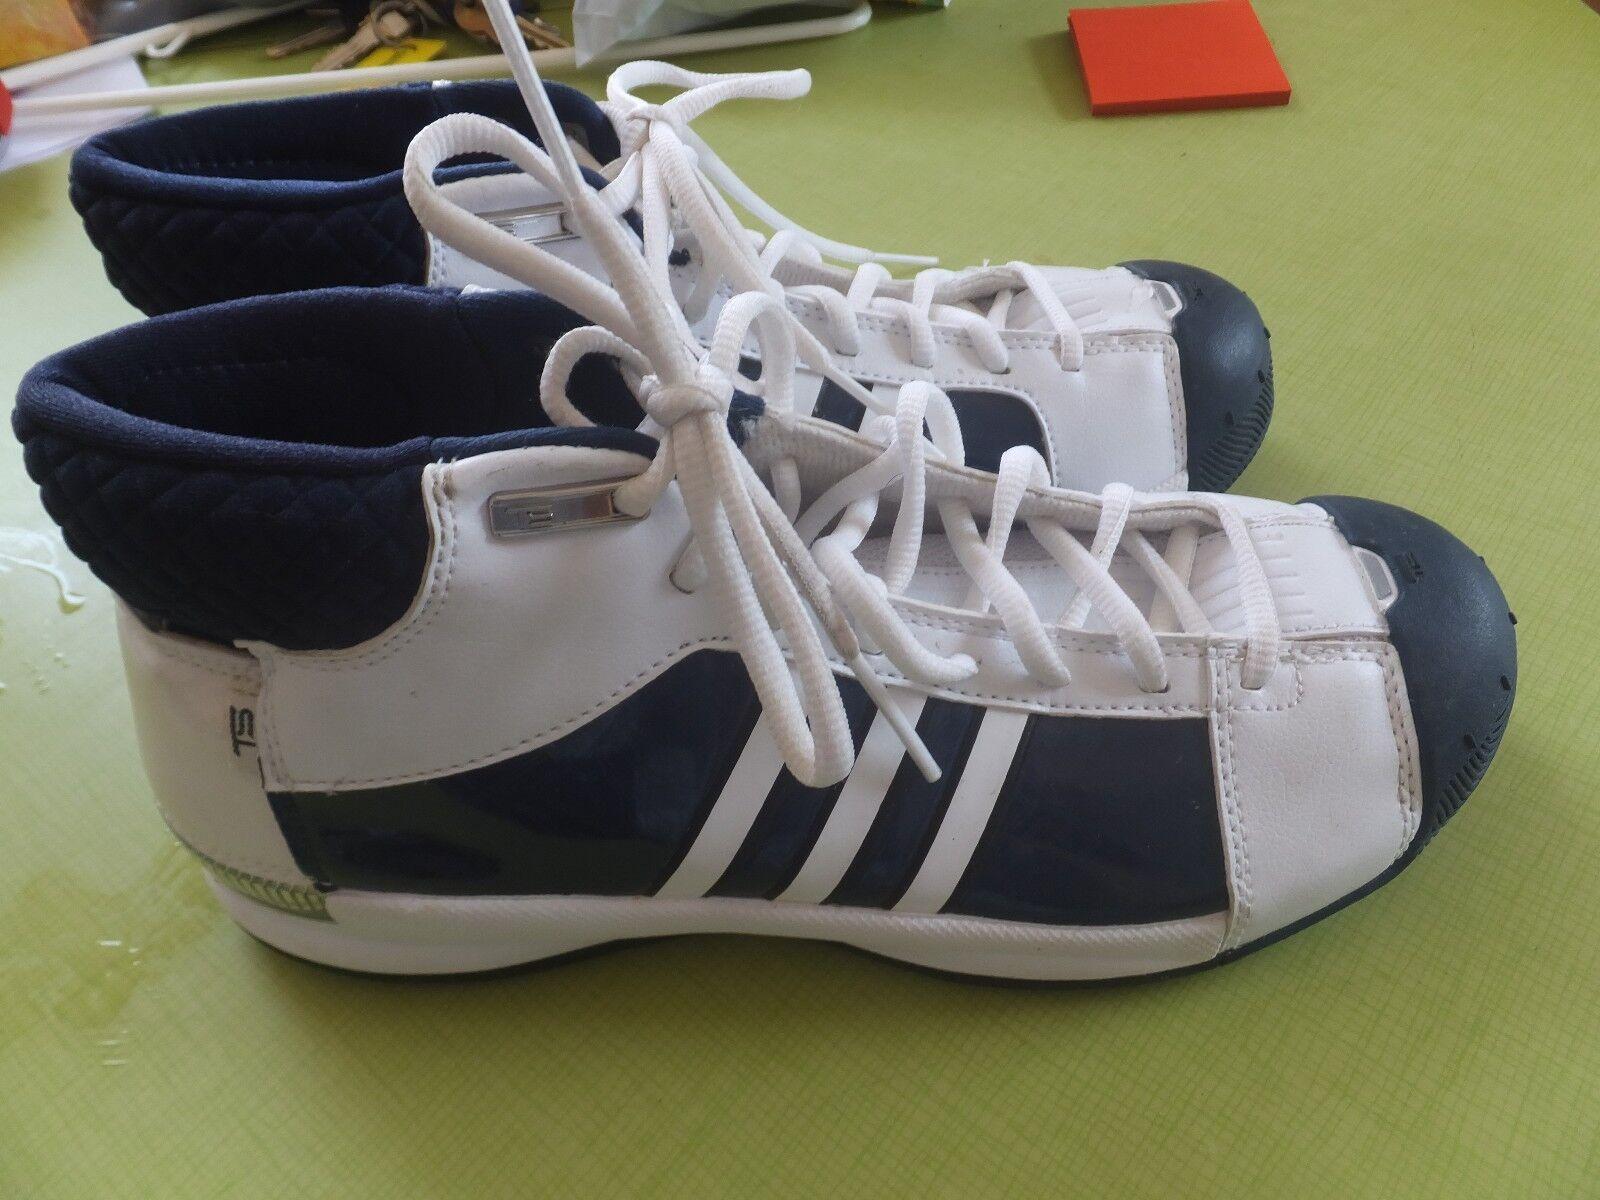 adidas t5 schuhe, zustand, makellosem zustand, 9.5m makellosem zustand, schuhe, navy und weiß ca1834